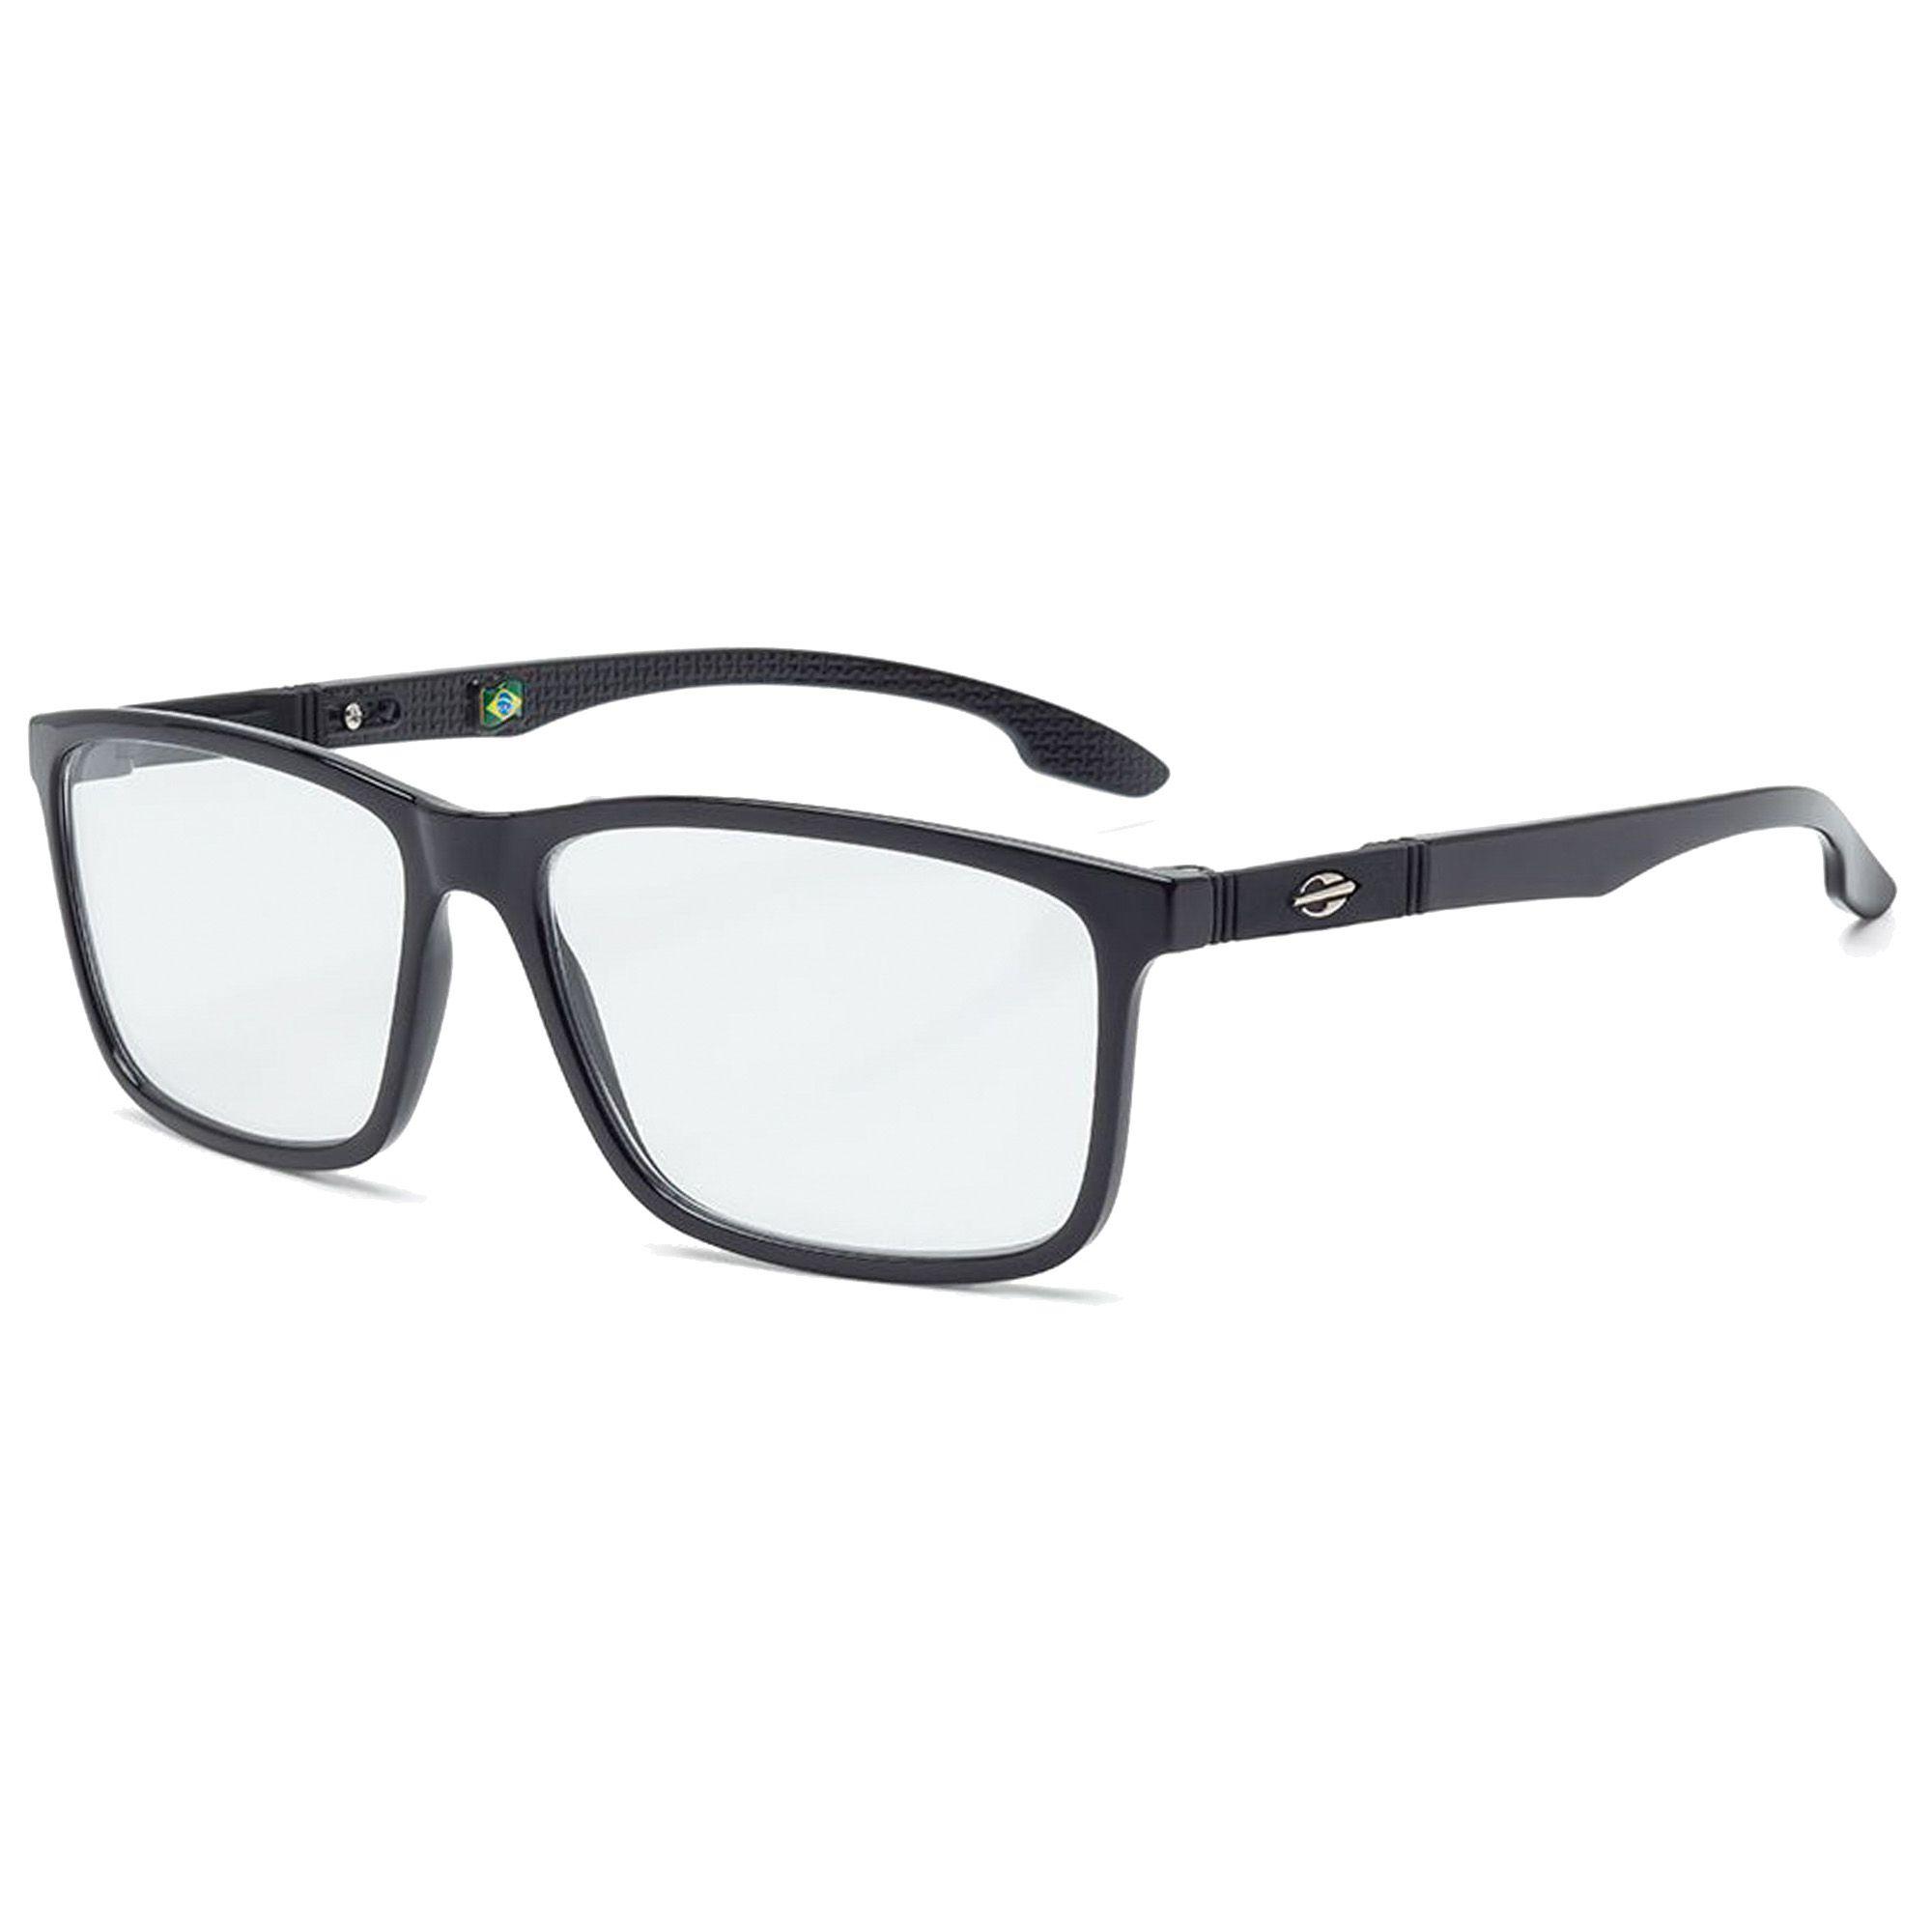 Óculos de Grau Unissex Mormaii Prana M6044ABX55